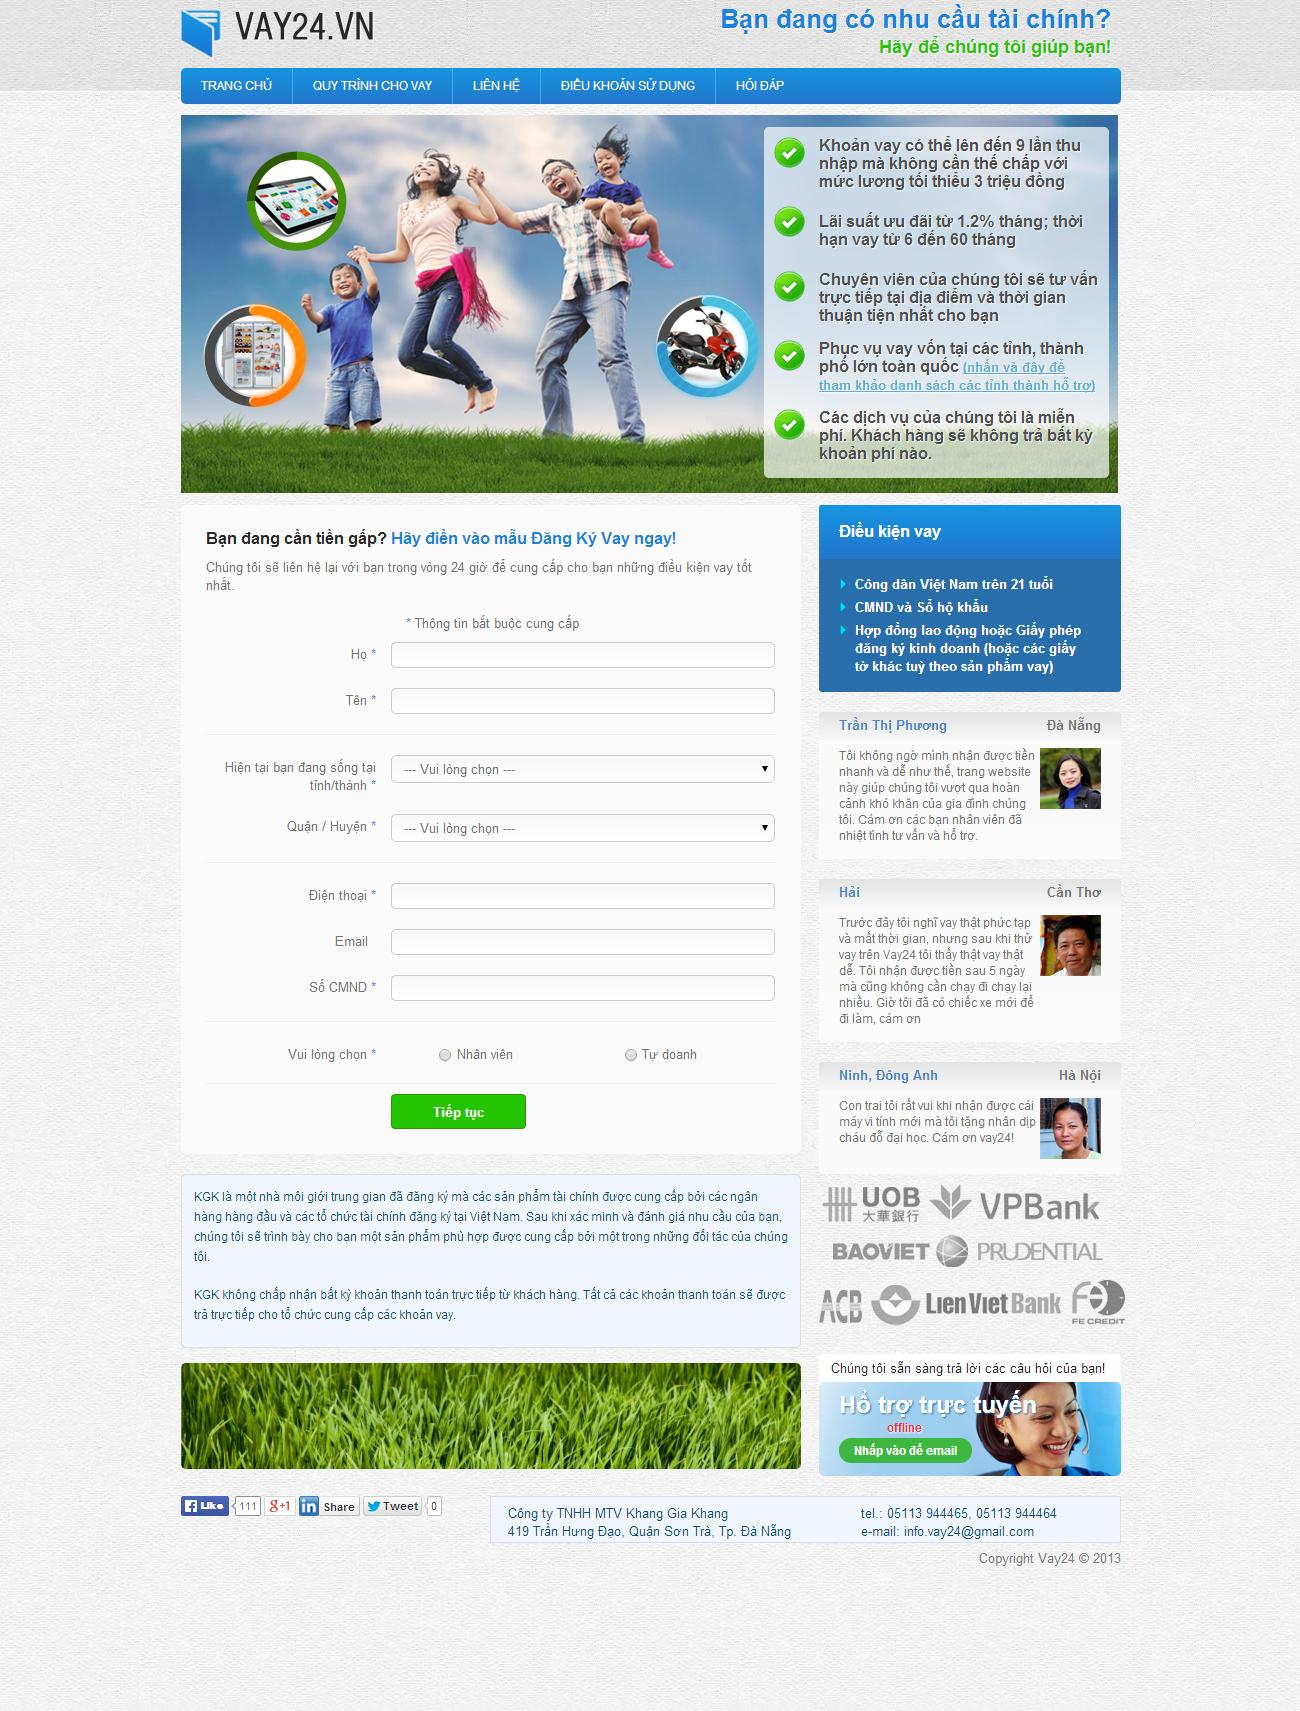 Vay24 - Вьетнамский банк